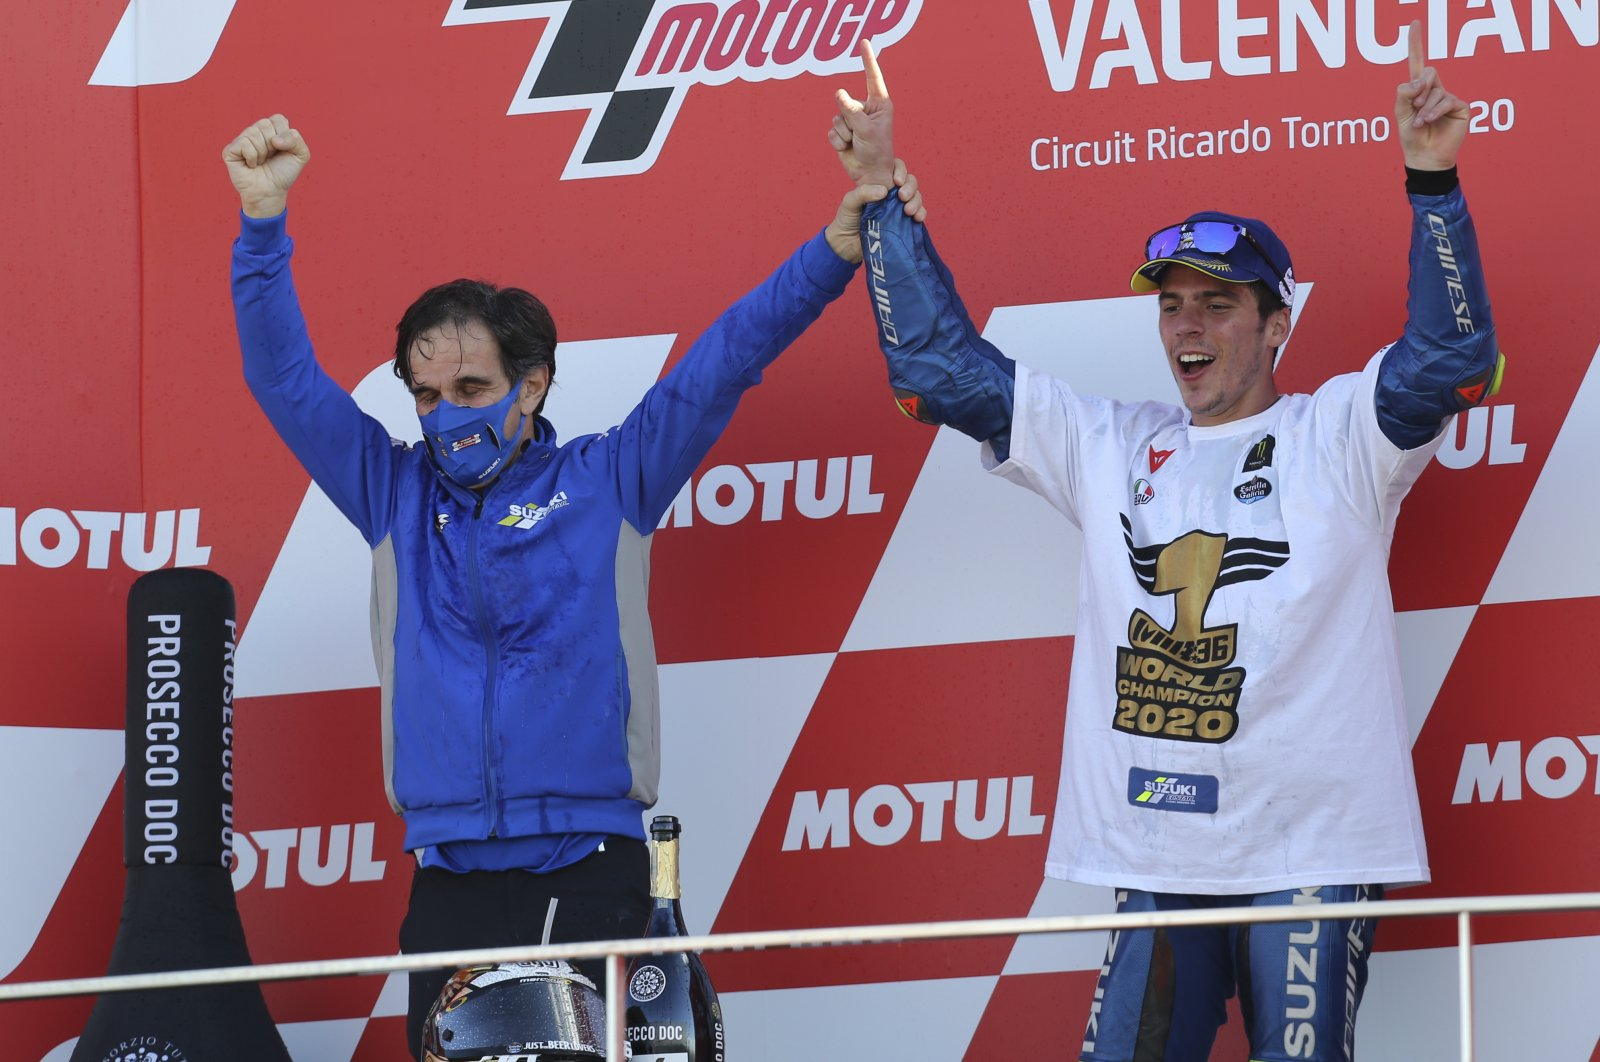 Suzuki manager Davide Brivio (L) and rider Joan Mir celebrate after winning MotoGP Valencia Grand Prix at the Ricardo Tormo Circuit, in Valencia, Spain, Nov. 15, 2020. (AP Photo)